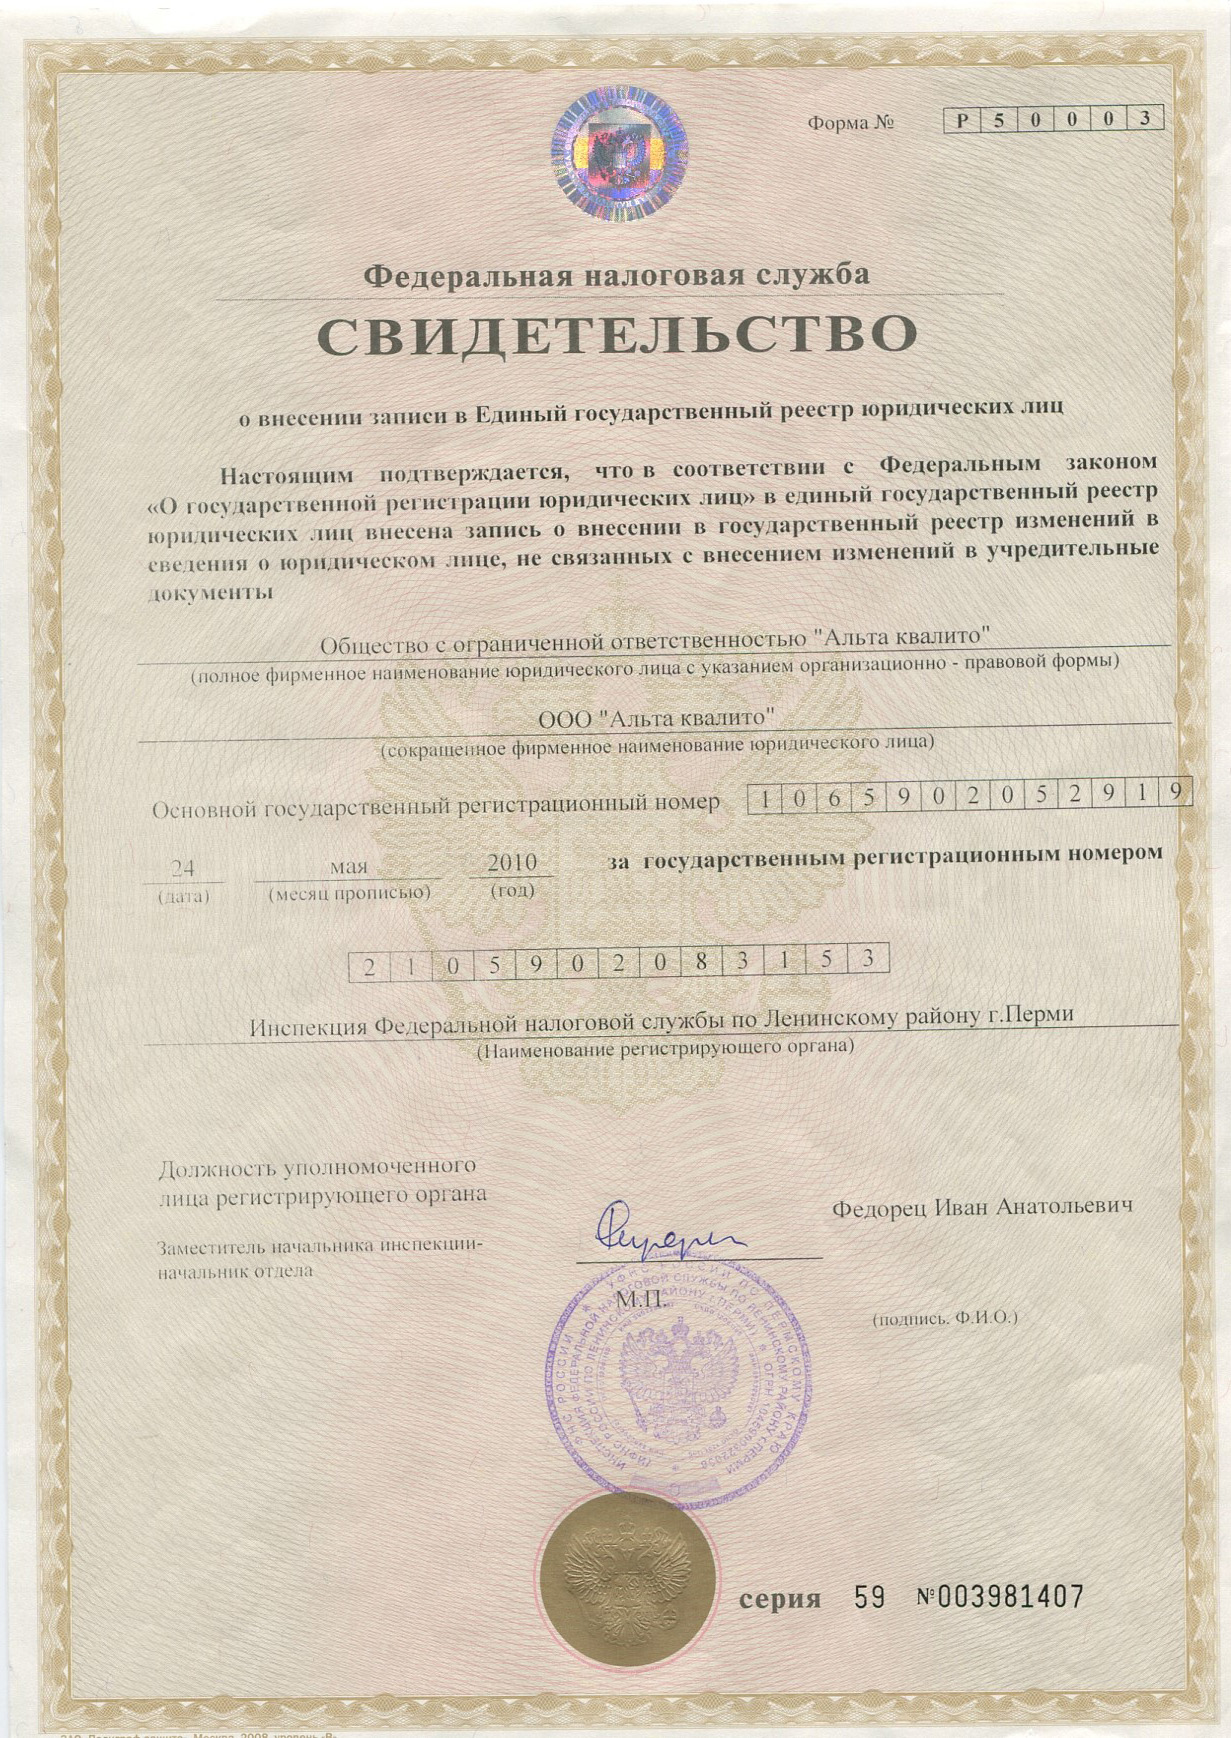 Медицинский центр г ярославля